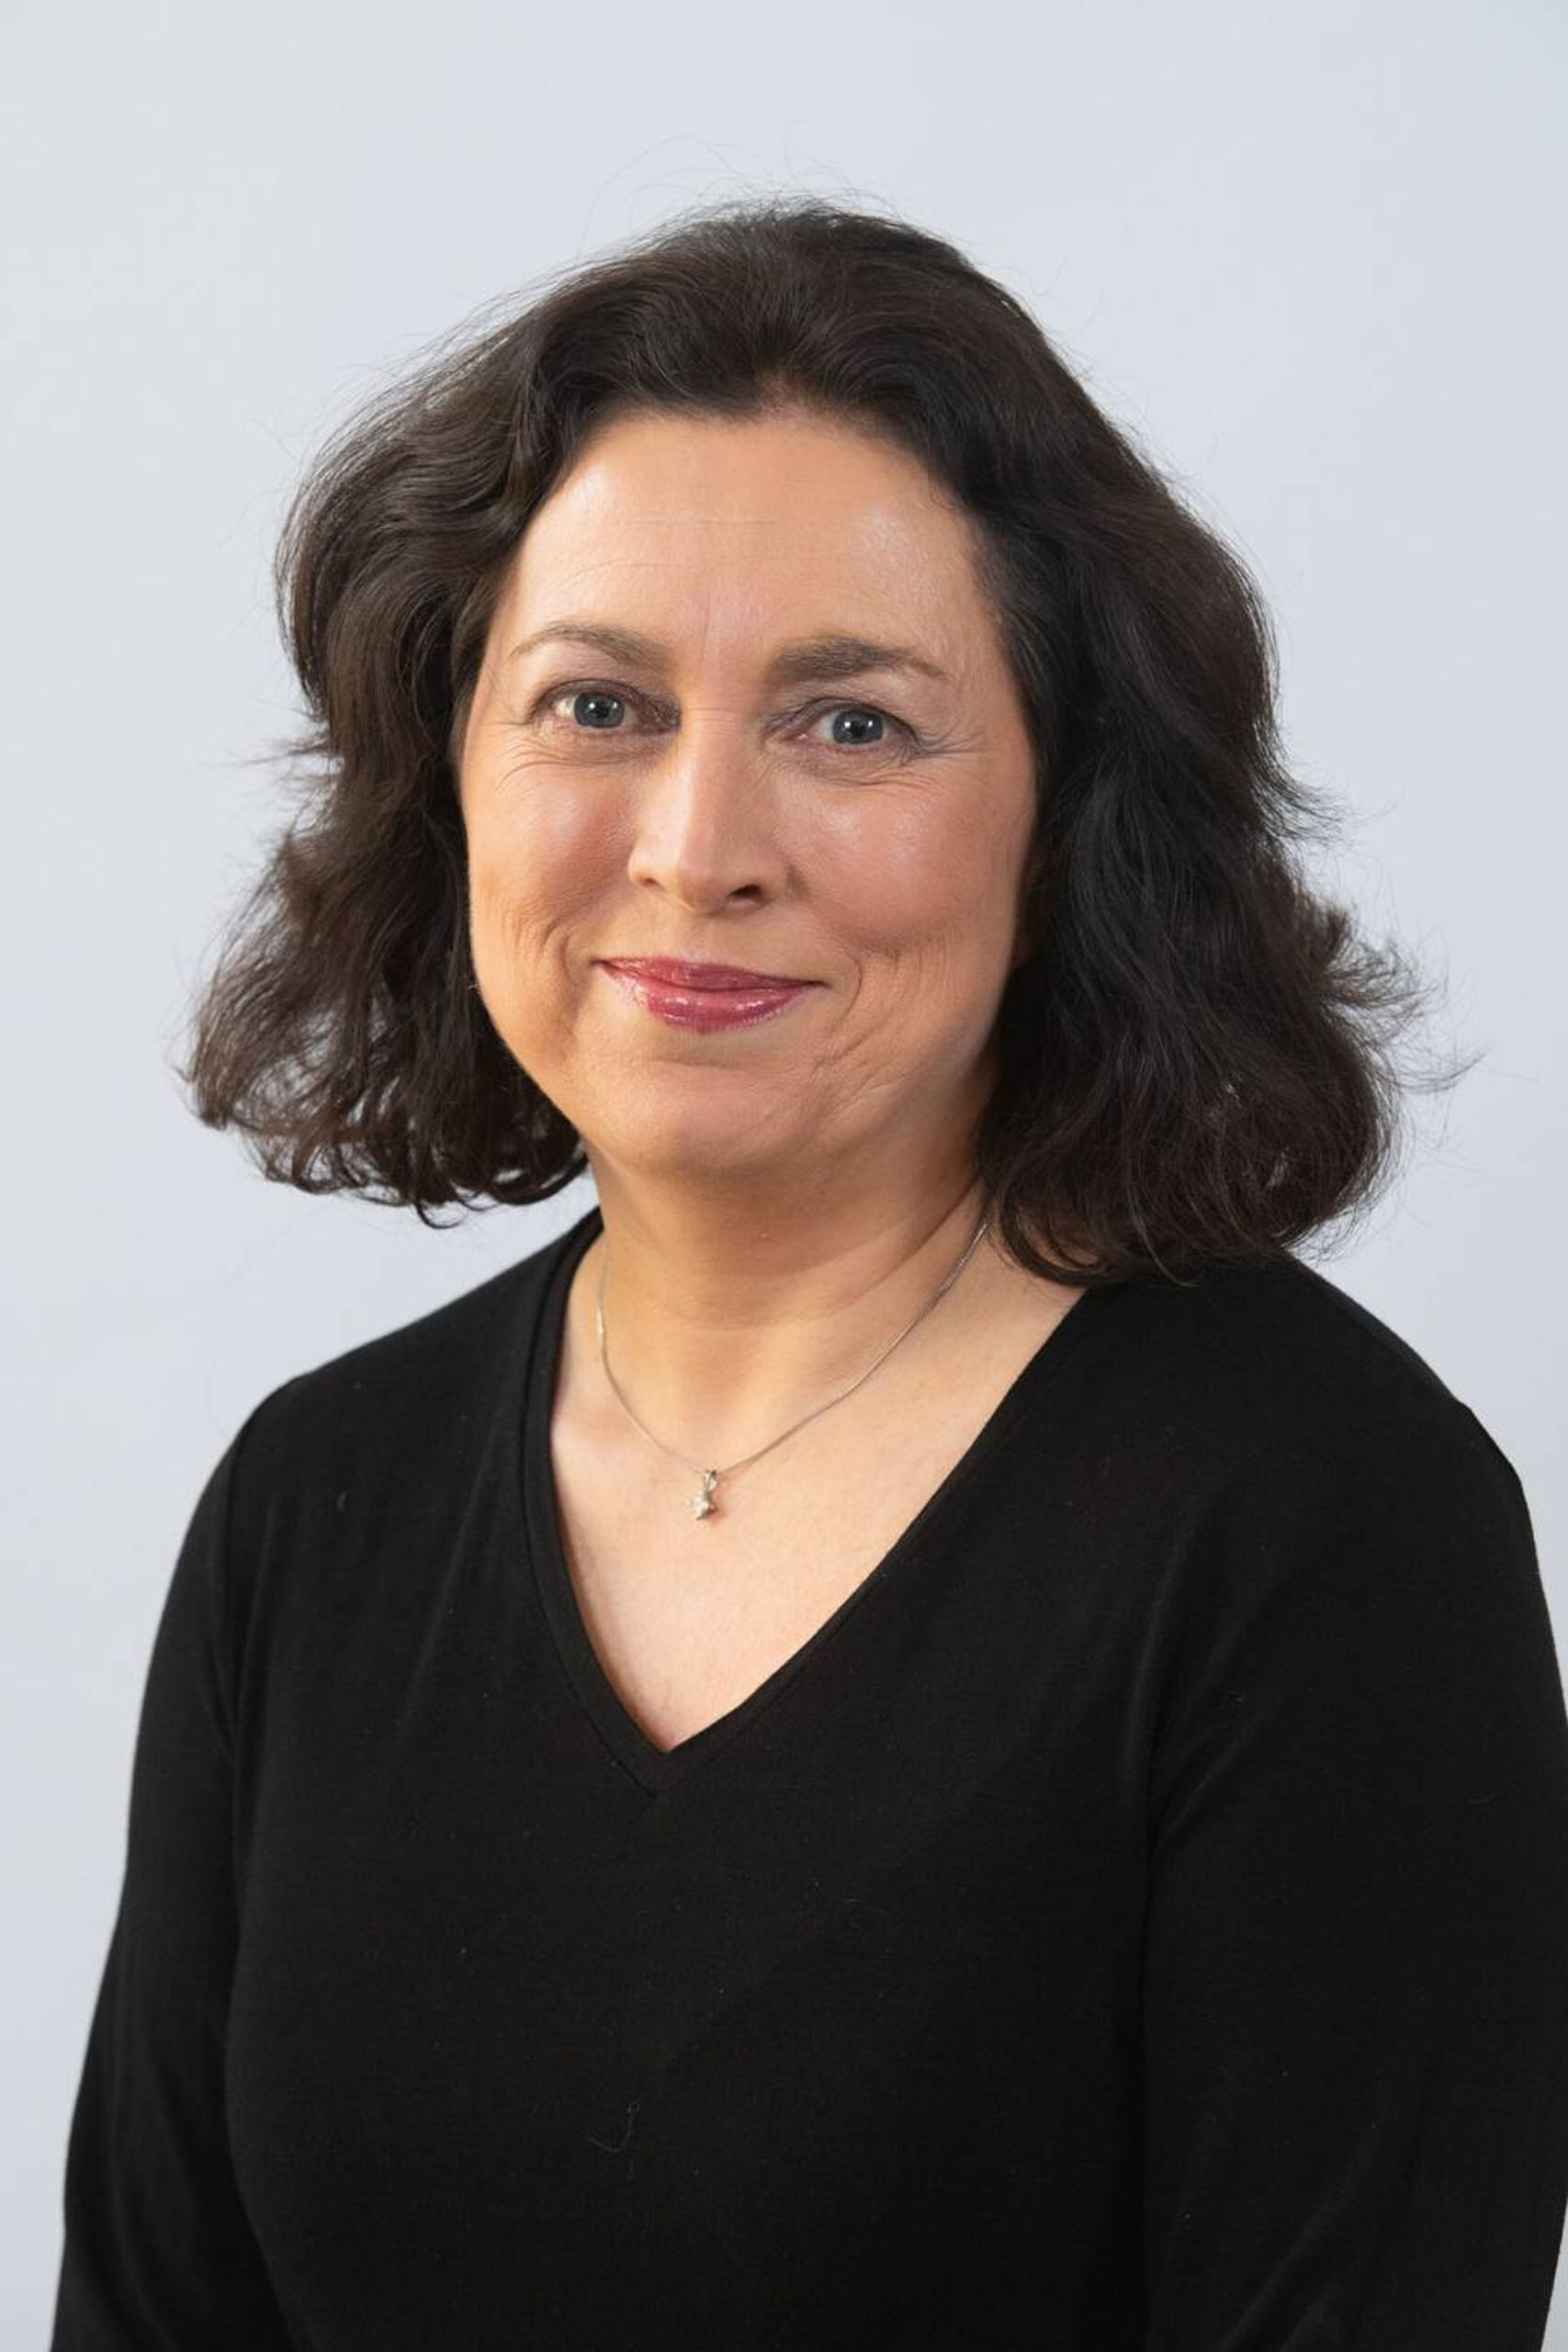 Frances Mair, medication risks, next avenue